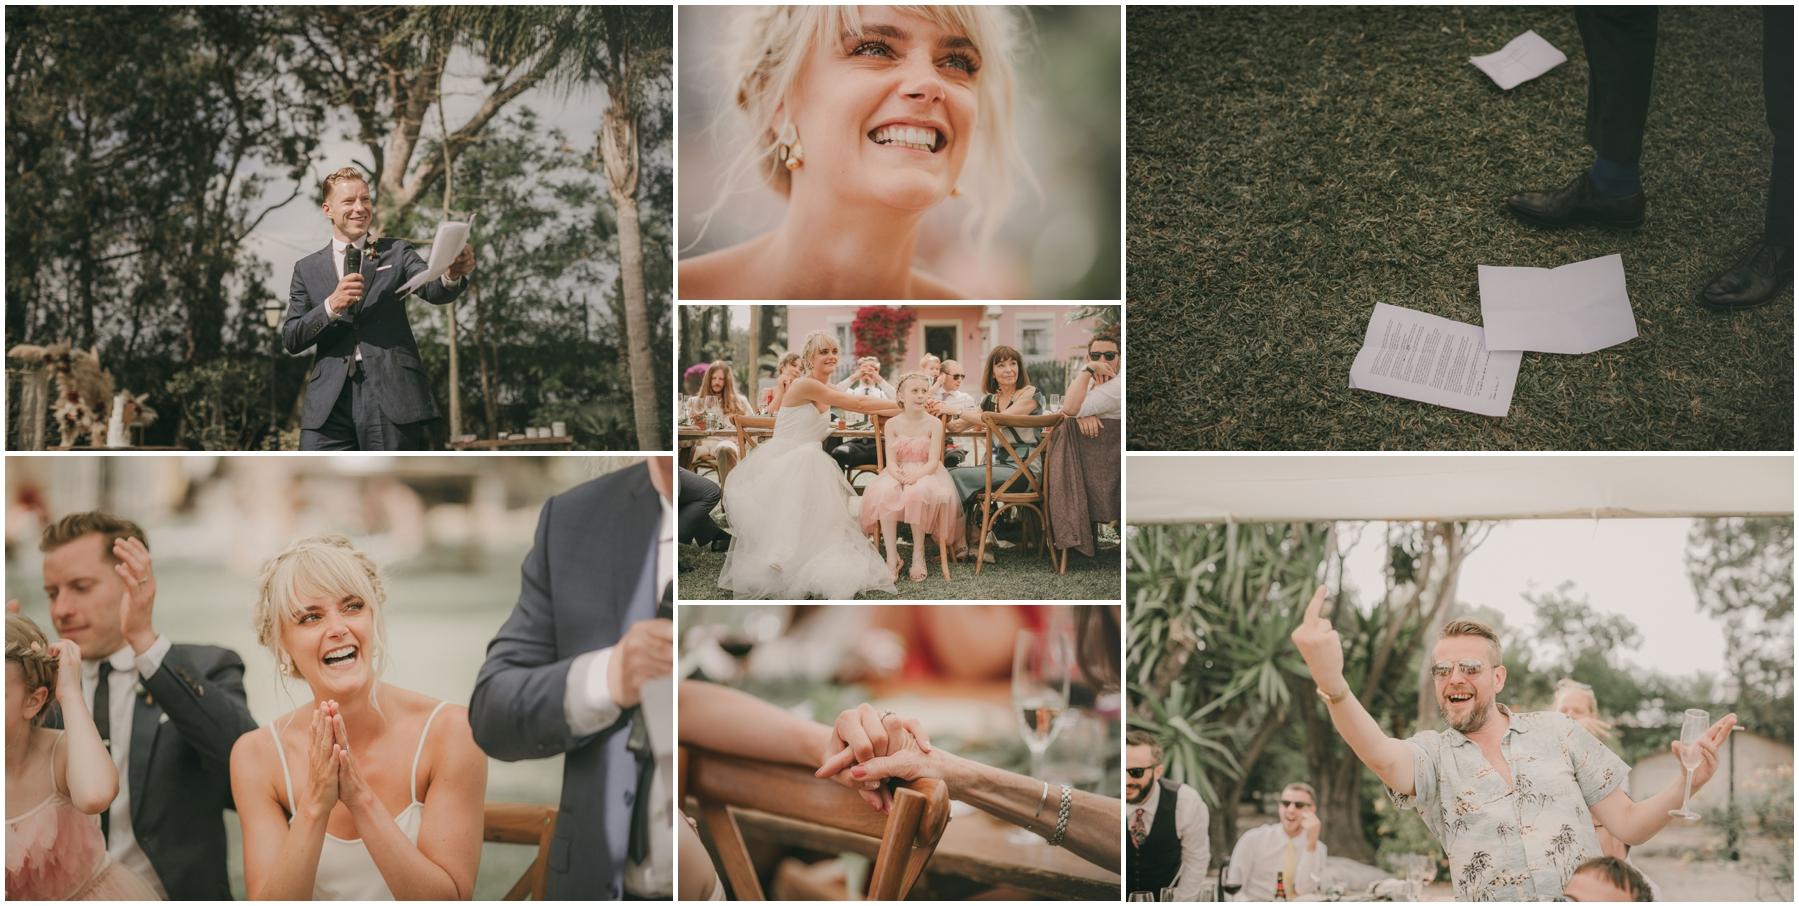 Emily & Joseph London wedding  by Pablo Laguia 170.JPG